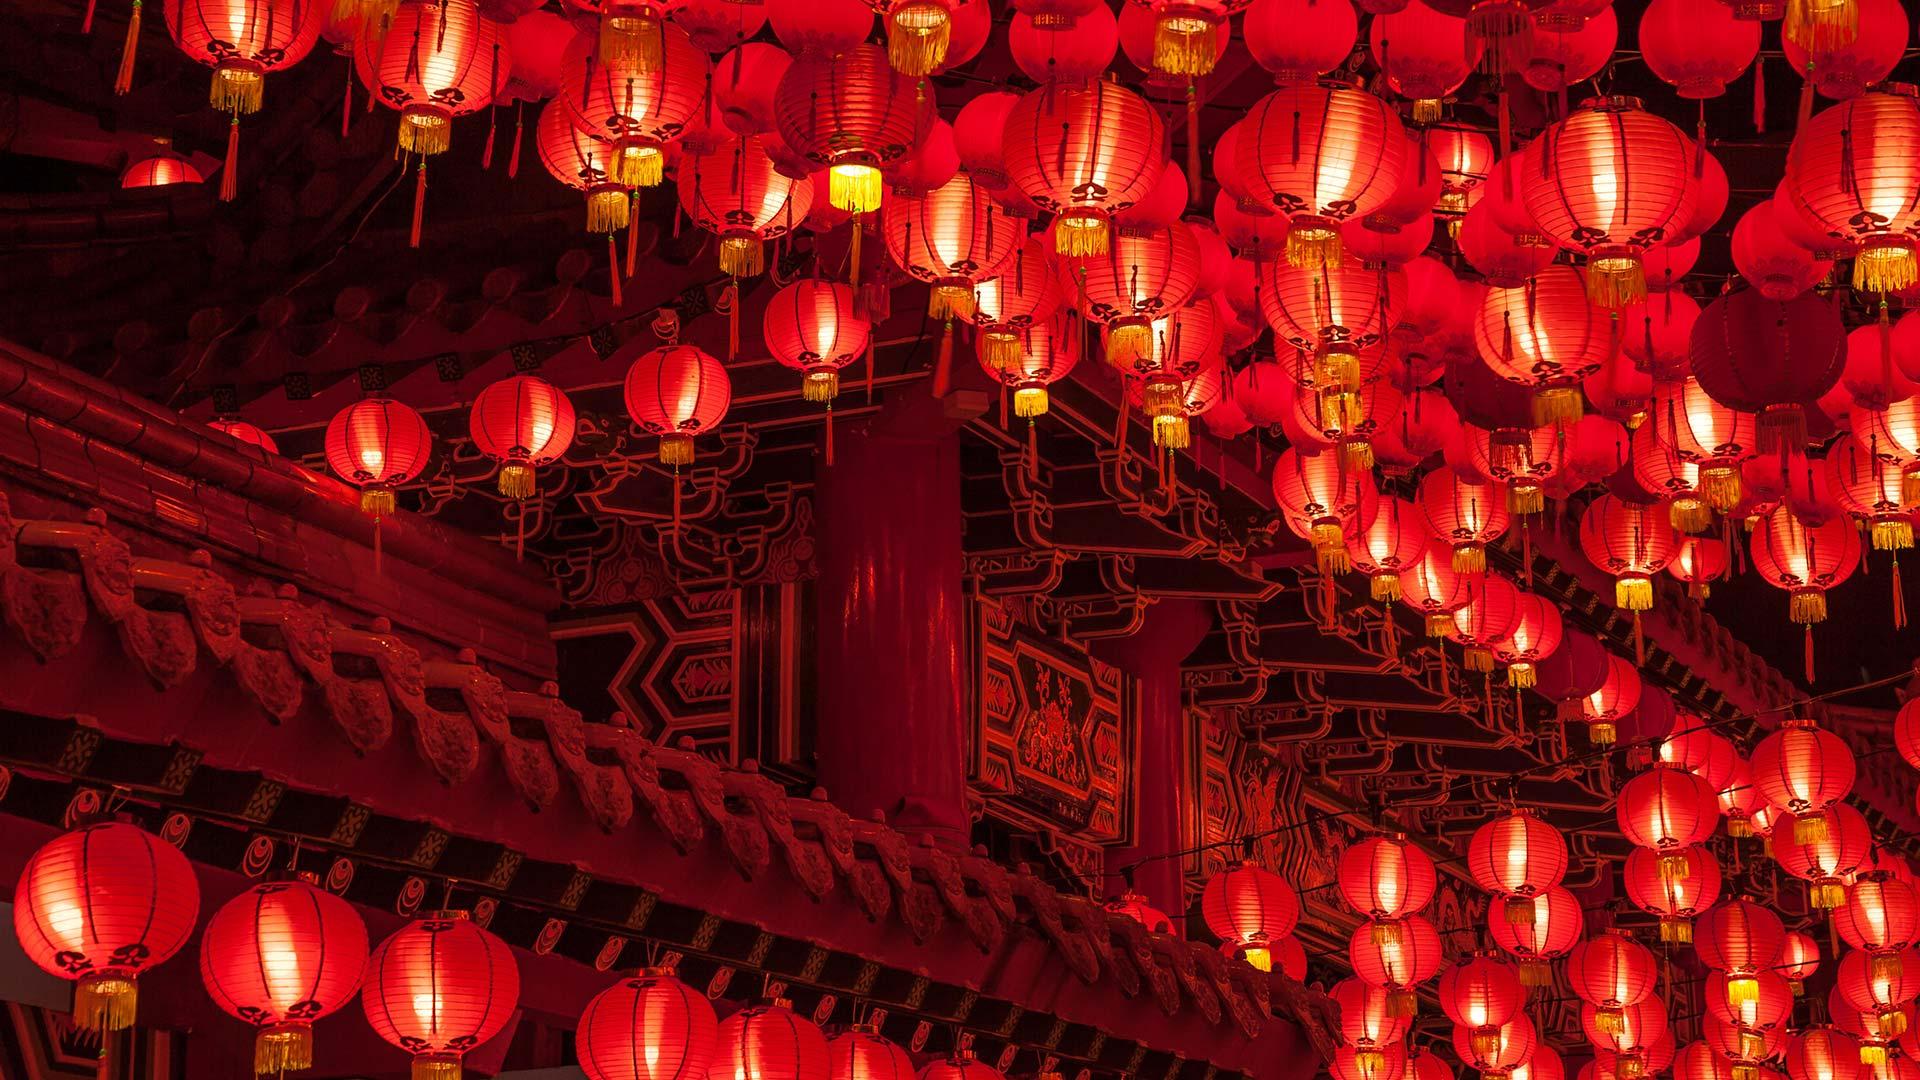 26 266793 lantern festial chinese aesthetic wallpaper laptop